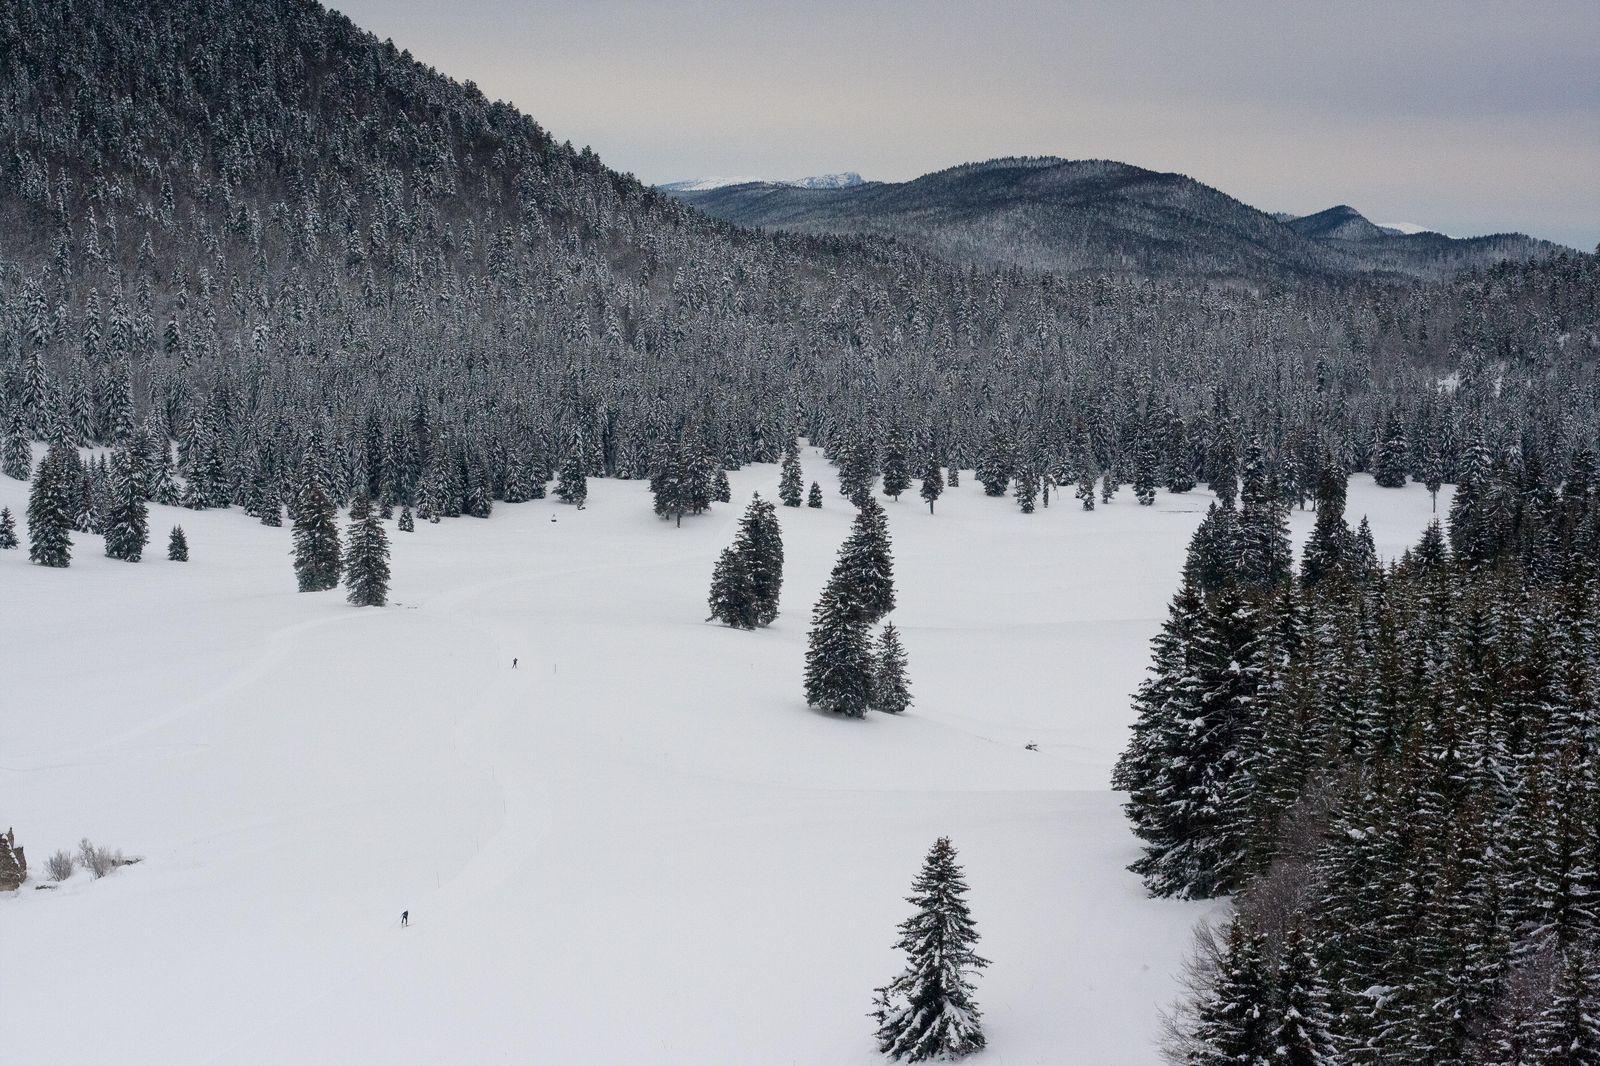 Station de ski de Lans en Vercors_Lans-en-Vercors